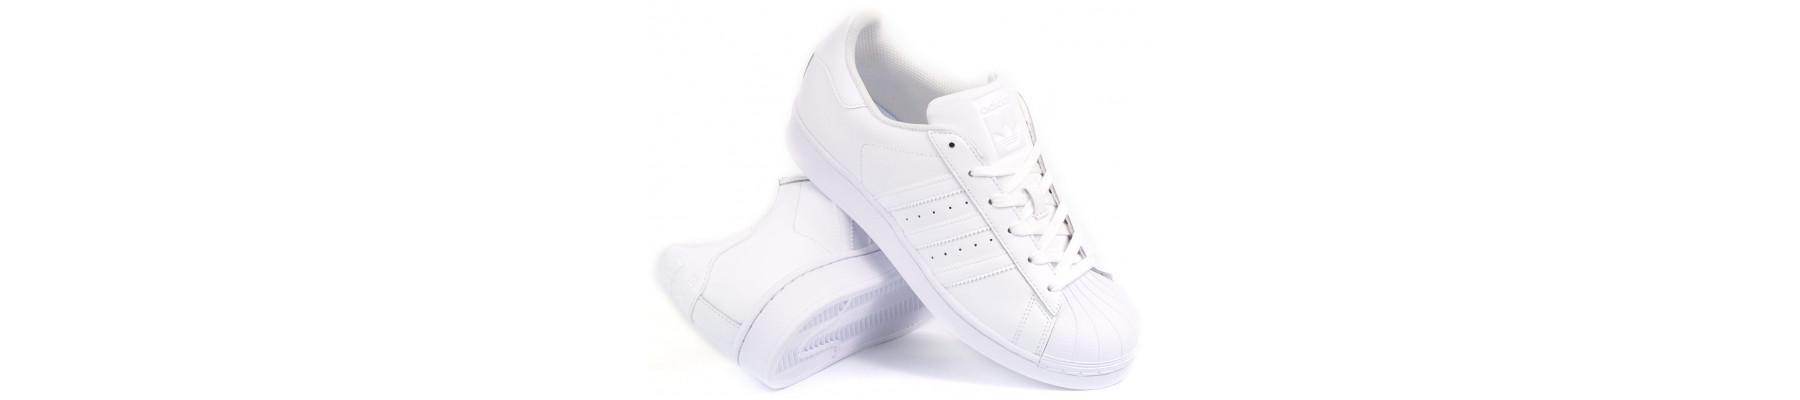 Adidas SuperStar WW Leather